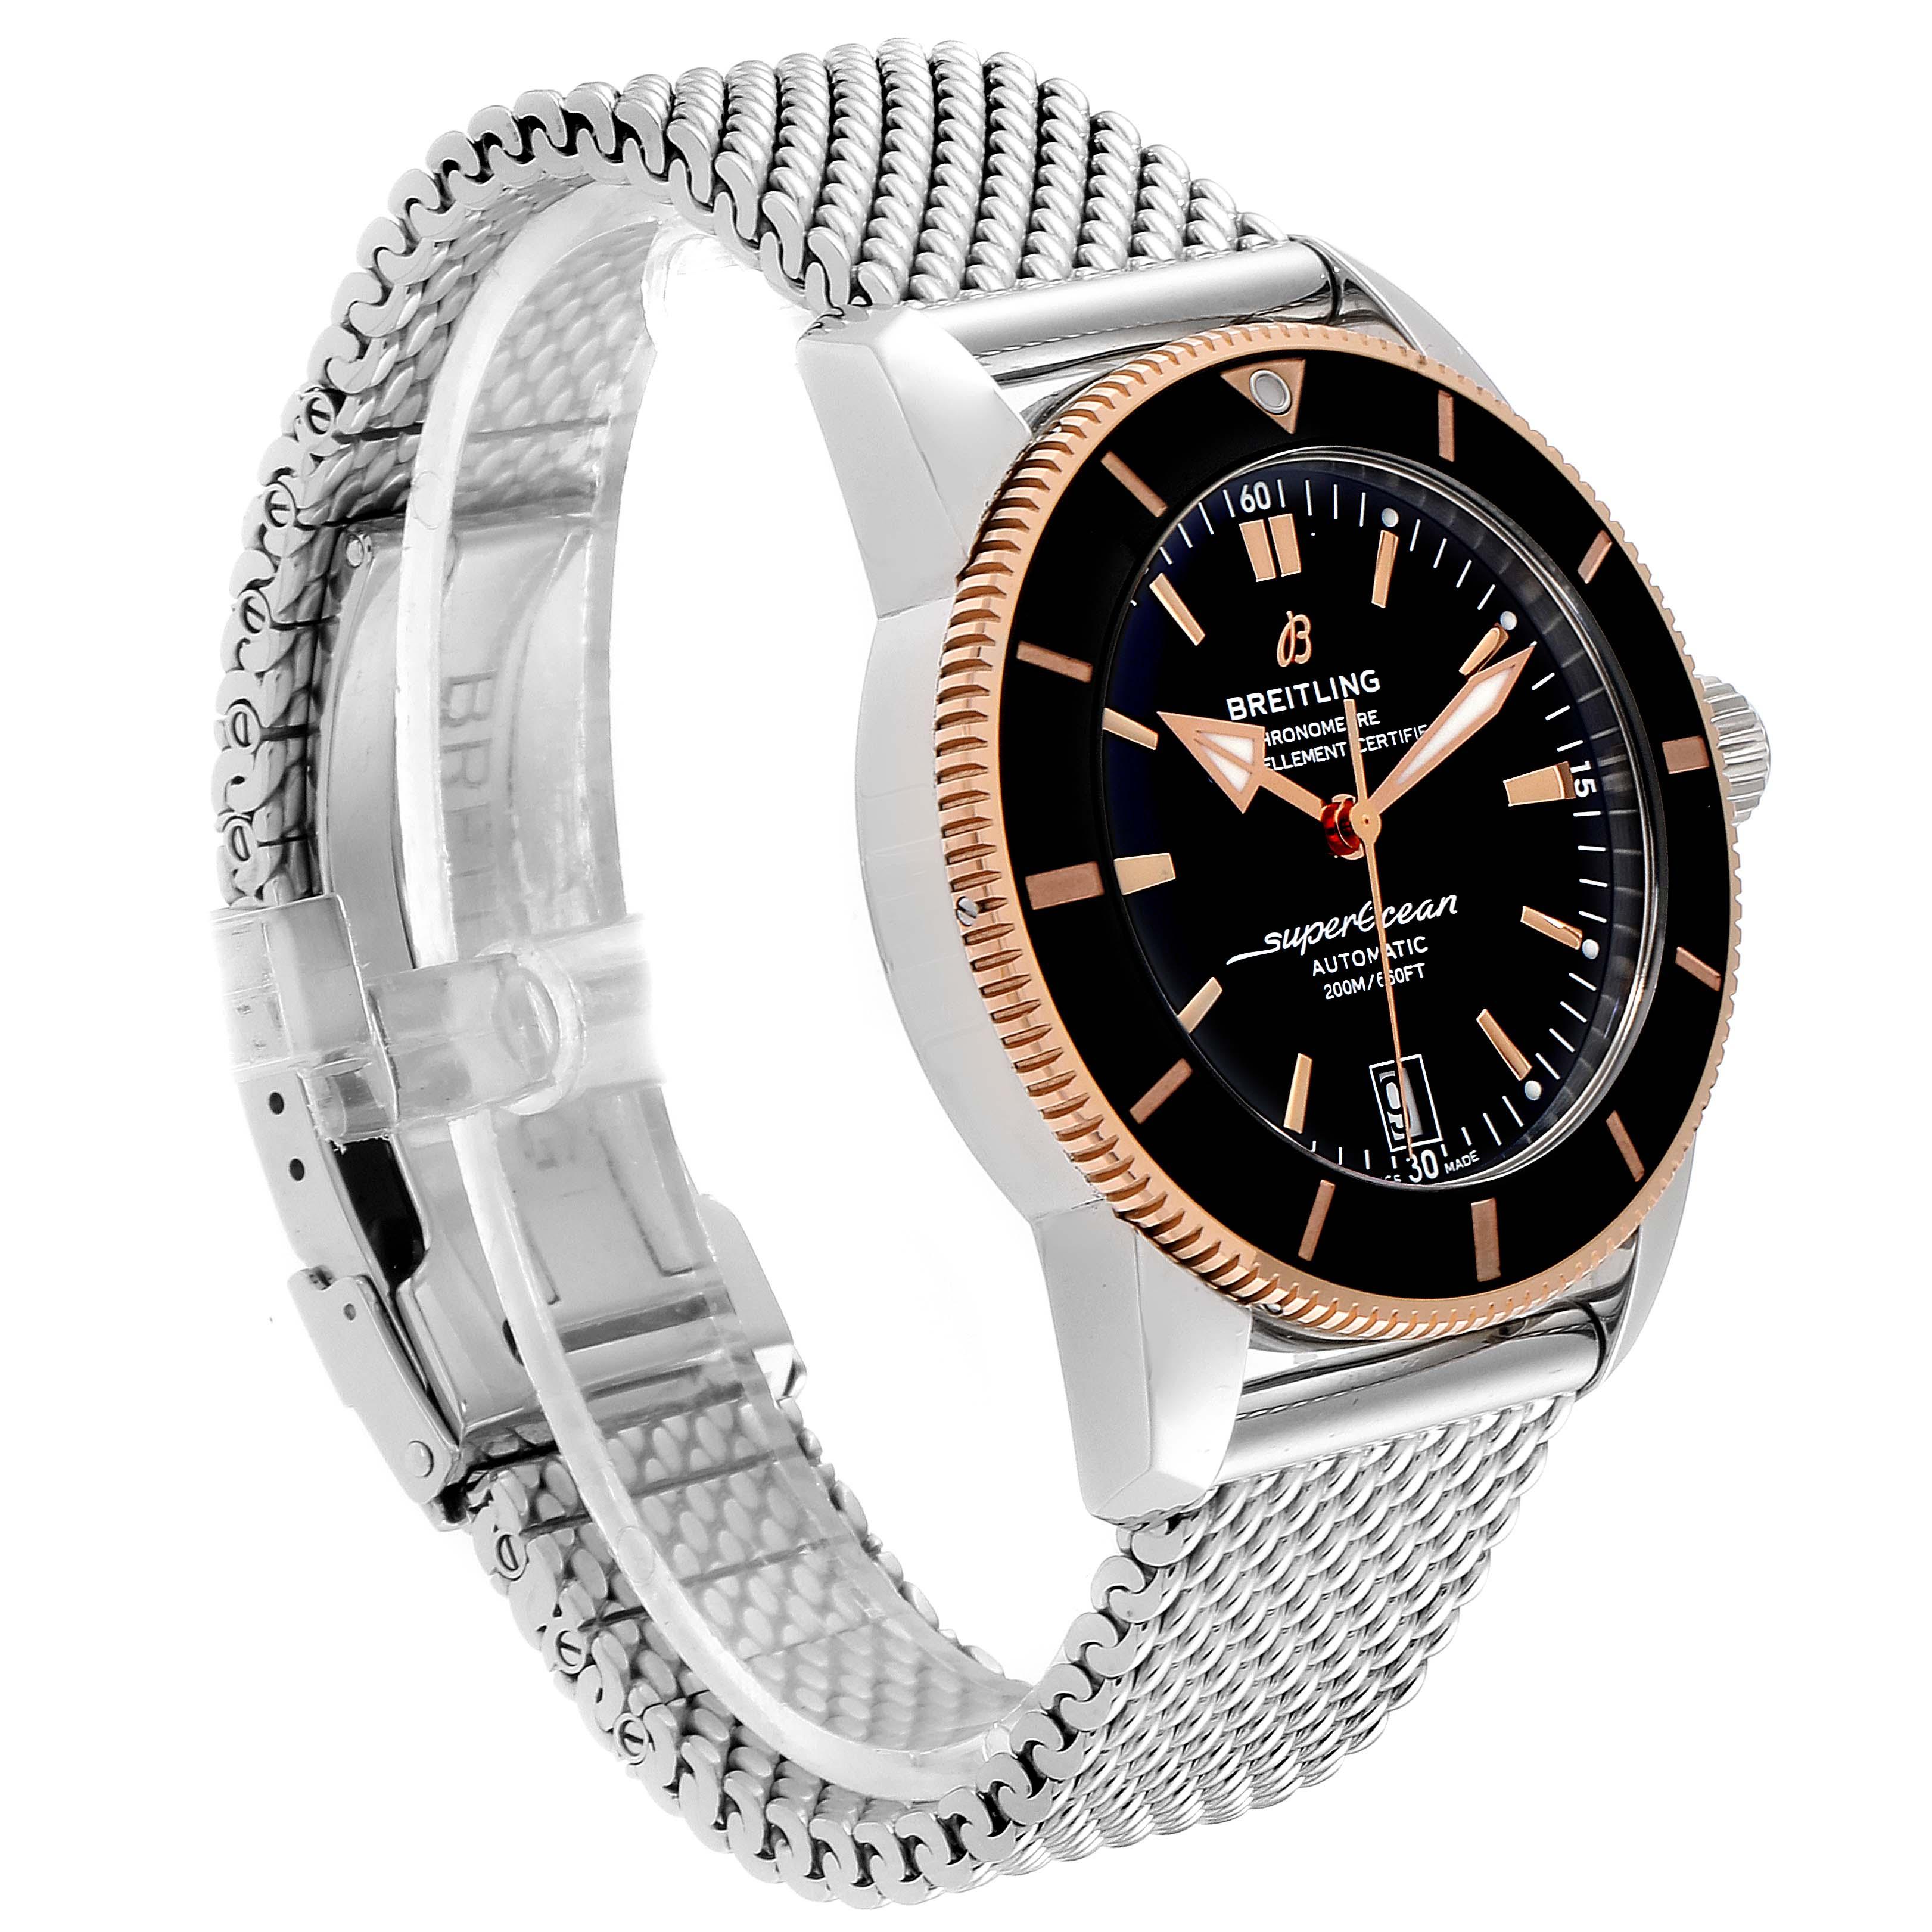 Breitling Superocean Heritage II 42 Steel Rose Gold Watch UB2010 Box Papers PARTIAL PAYMENT SwissWatchExpo